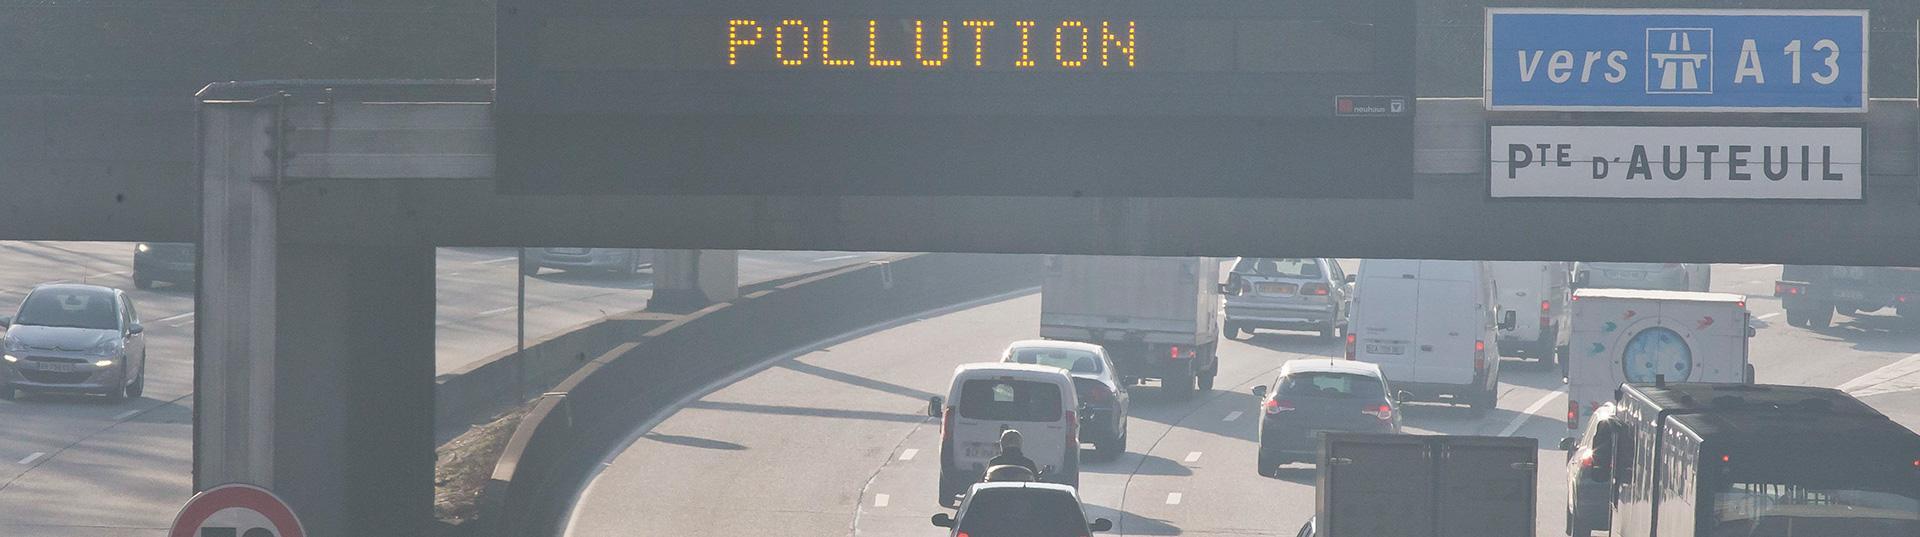 pollution 1920